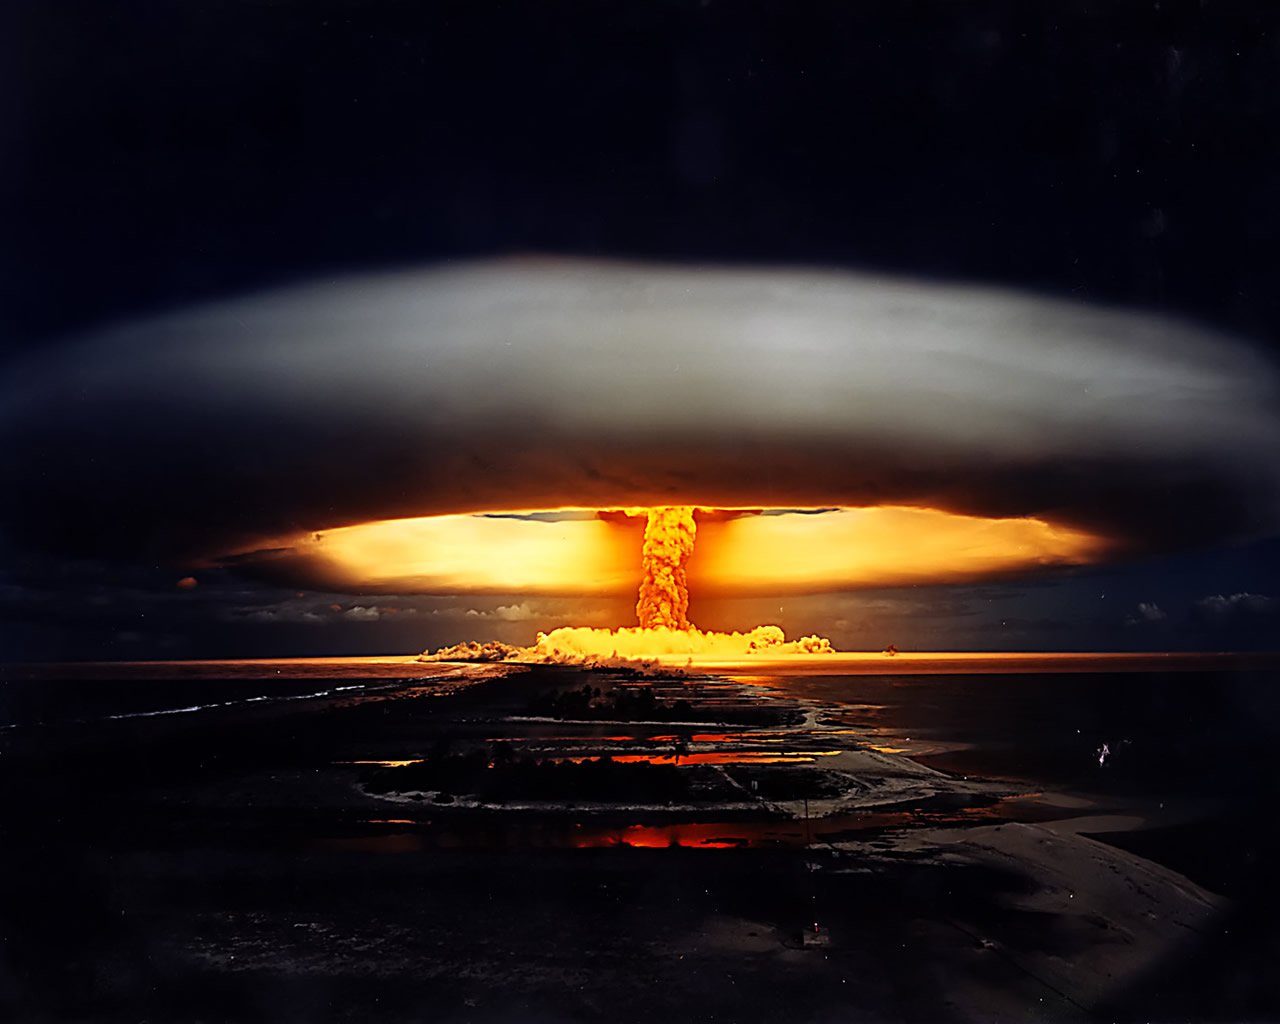 http://3.bp.blogspot.com/-DAZFxZAHx7o/UMkgc2kJCbI/AAAAAAAARZg/Mj4HywuRusc/s1600/35105d1340914007-fondos-de-pantalla-hd-3d-explosion-20nucleo.jpg